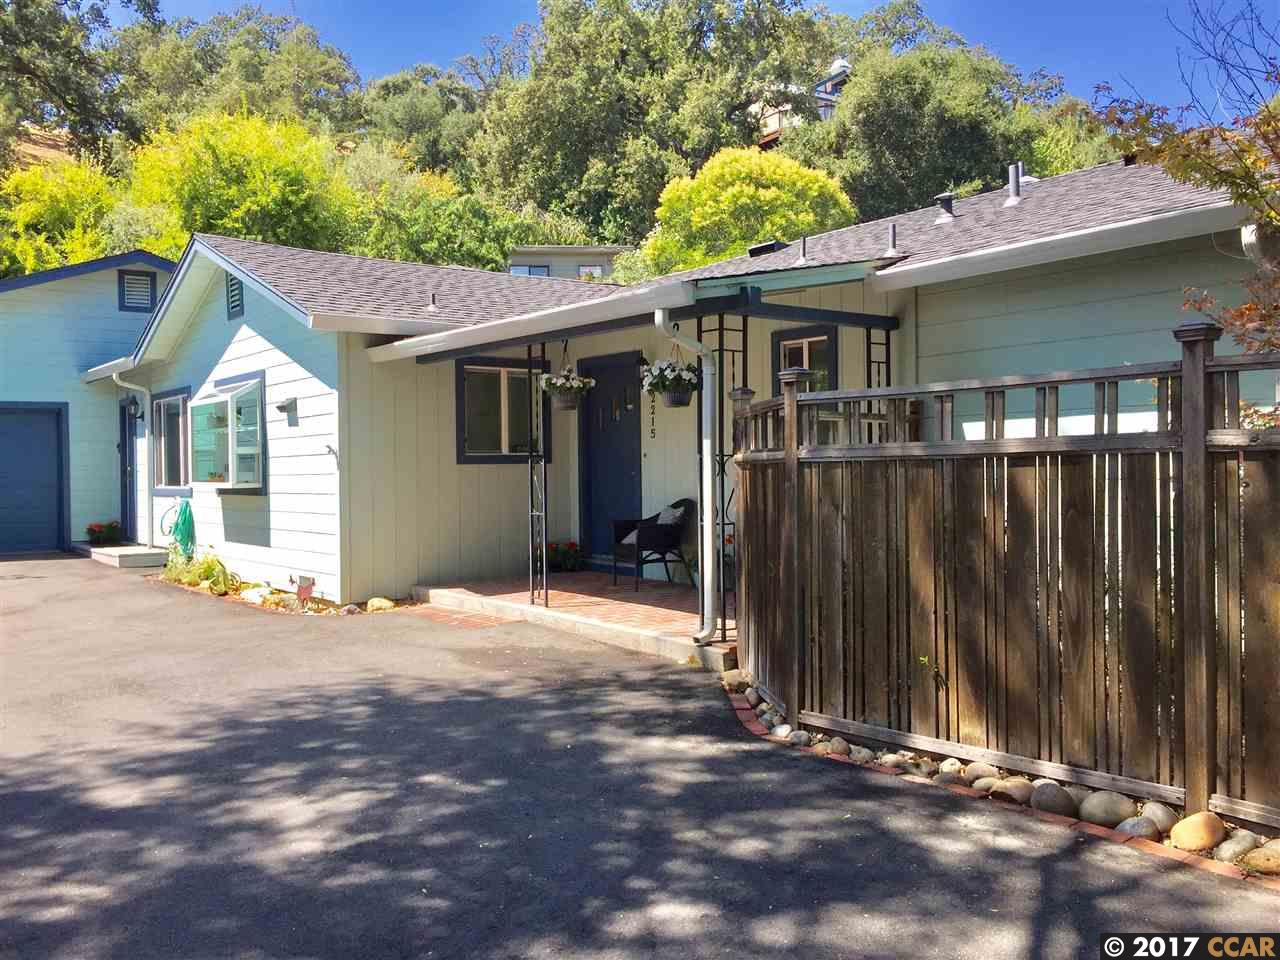 獨棟家庭住宅 為 出售 在 2215 oakvale road 2215 oakvale road Walnut Creek, 加利福尼亞州 94597 美國